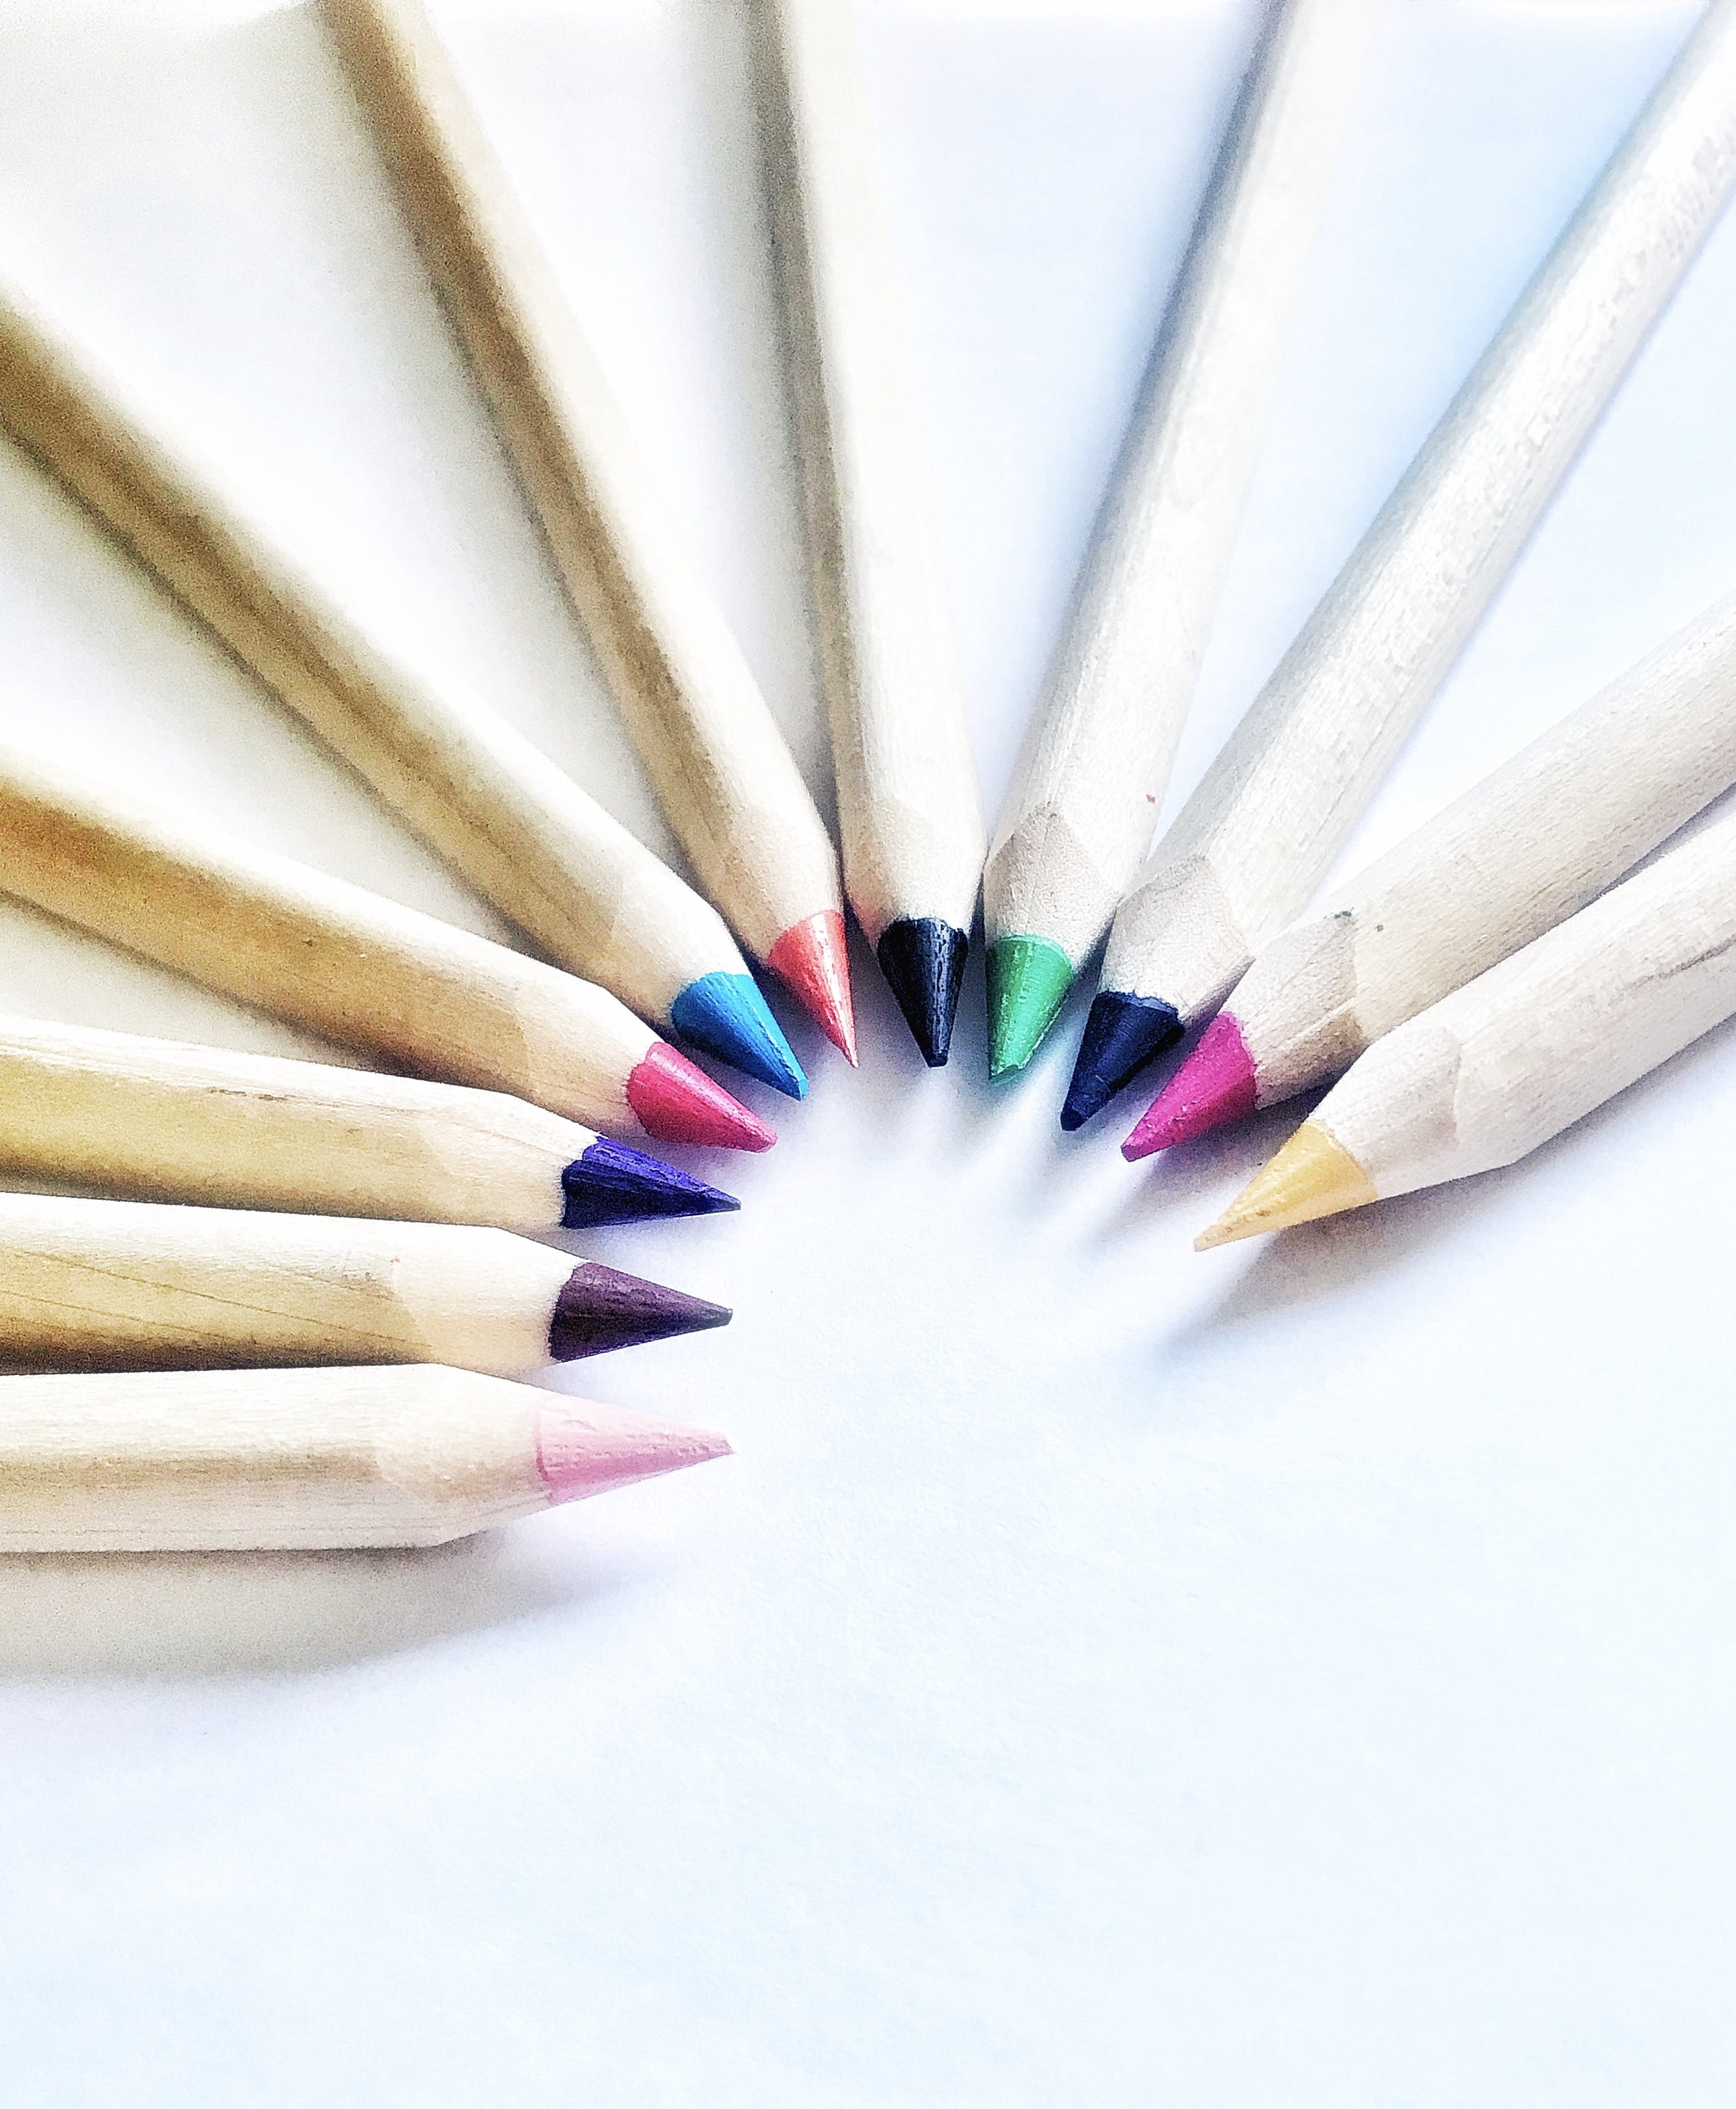 Kostenloses Stock Foto zu farbe, farbstiften, helle farben